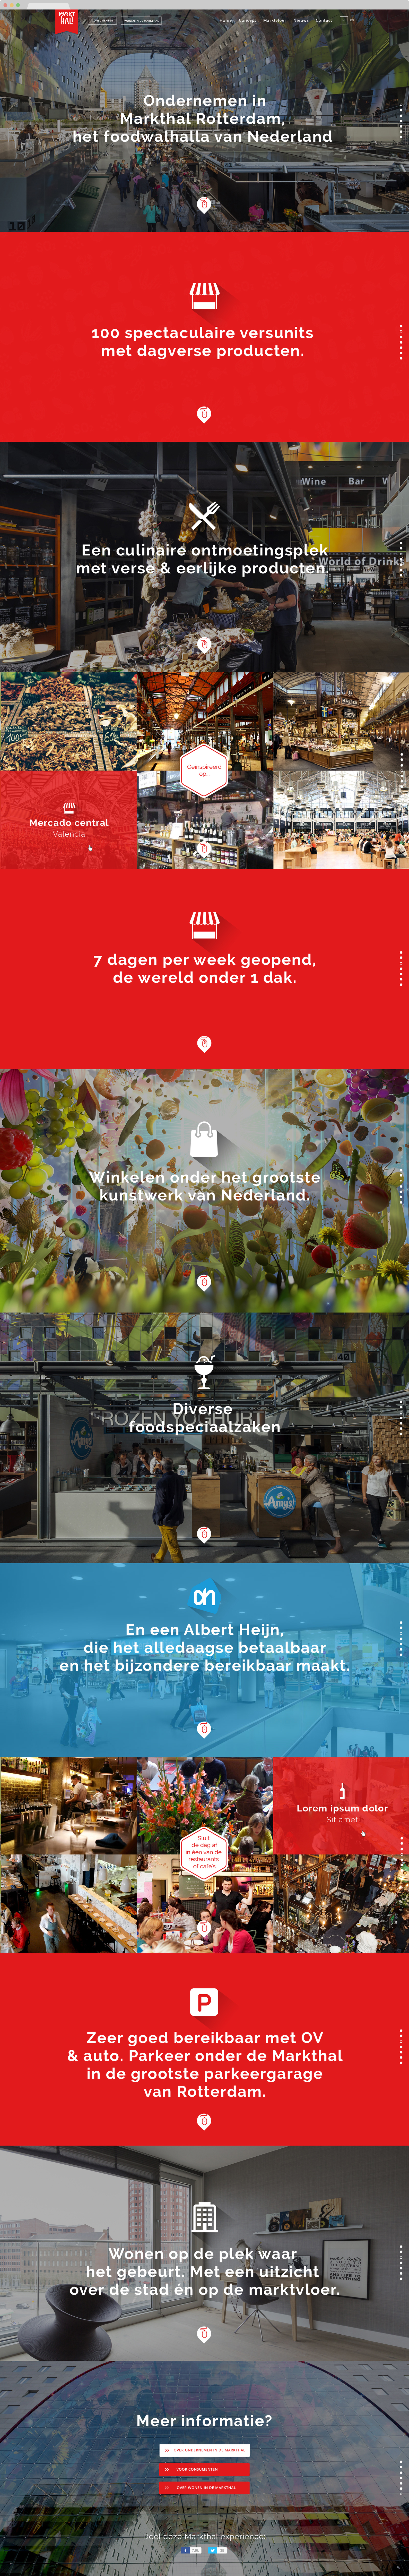 web design hk foodmarketrotterdam 01